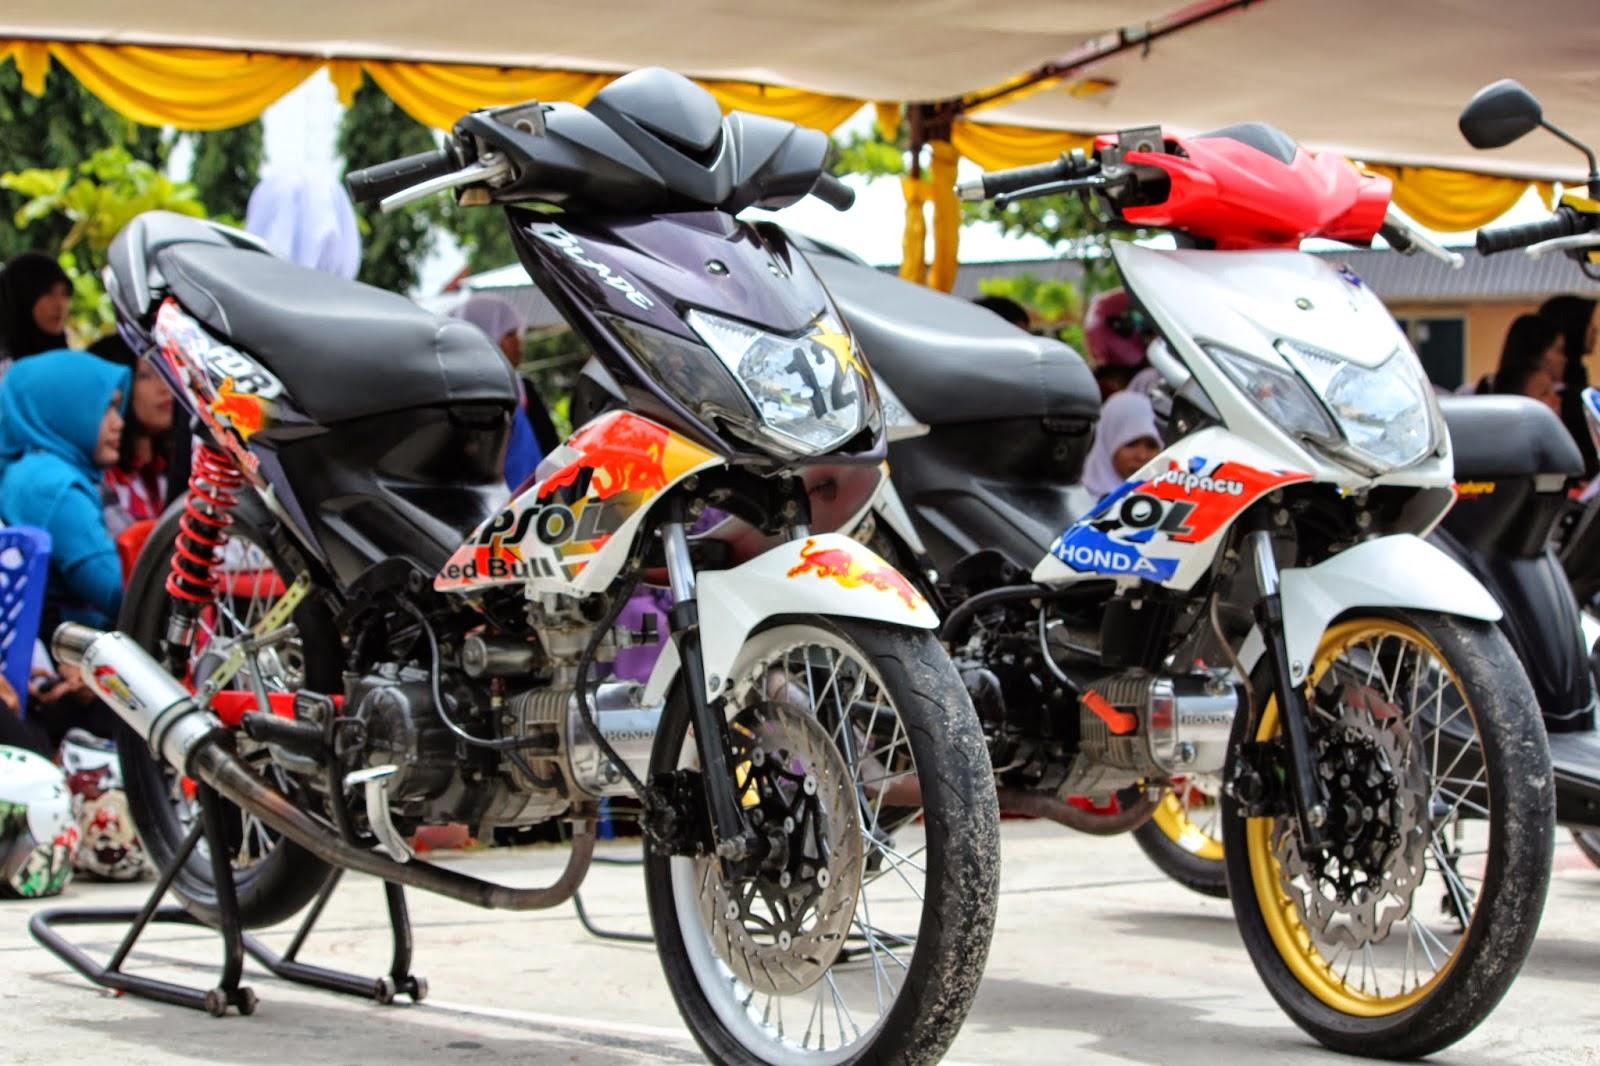 Modifikasi Motor Blade Repsol New  Thecitycyclist